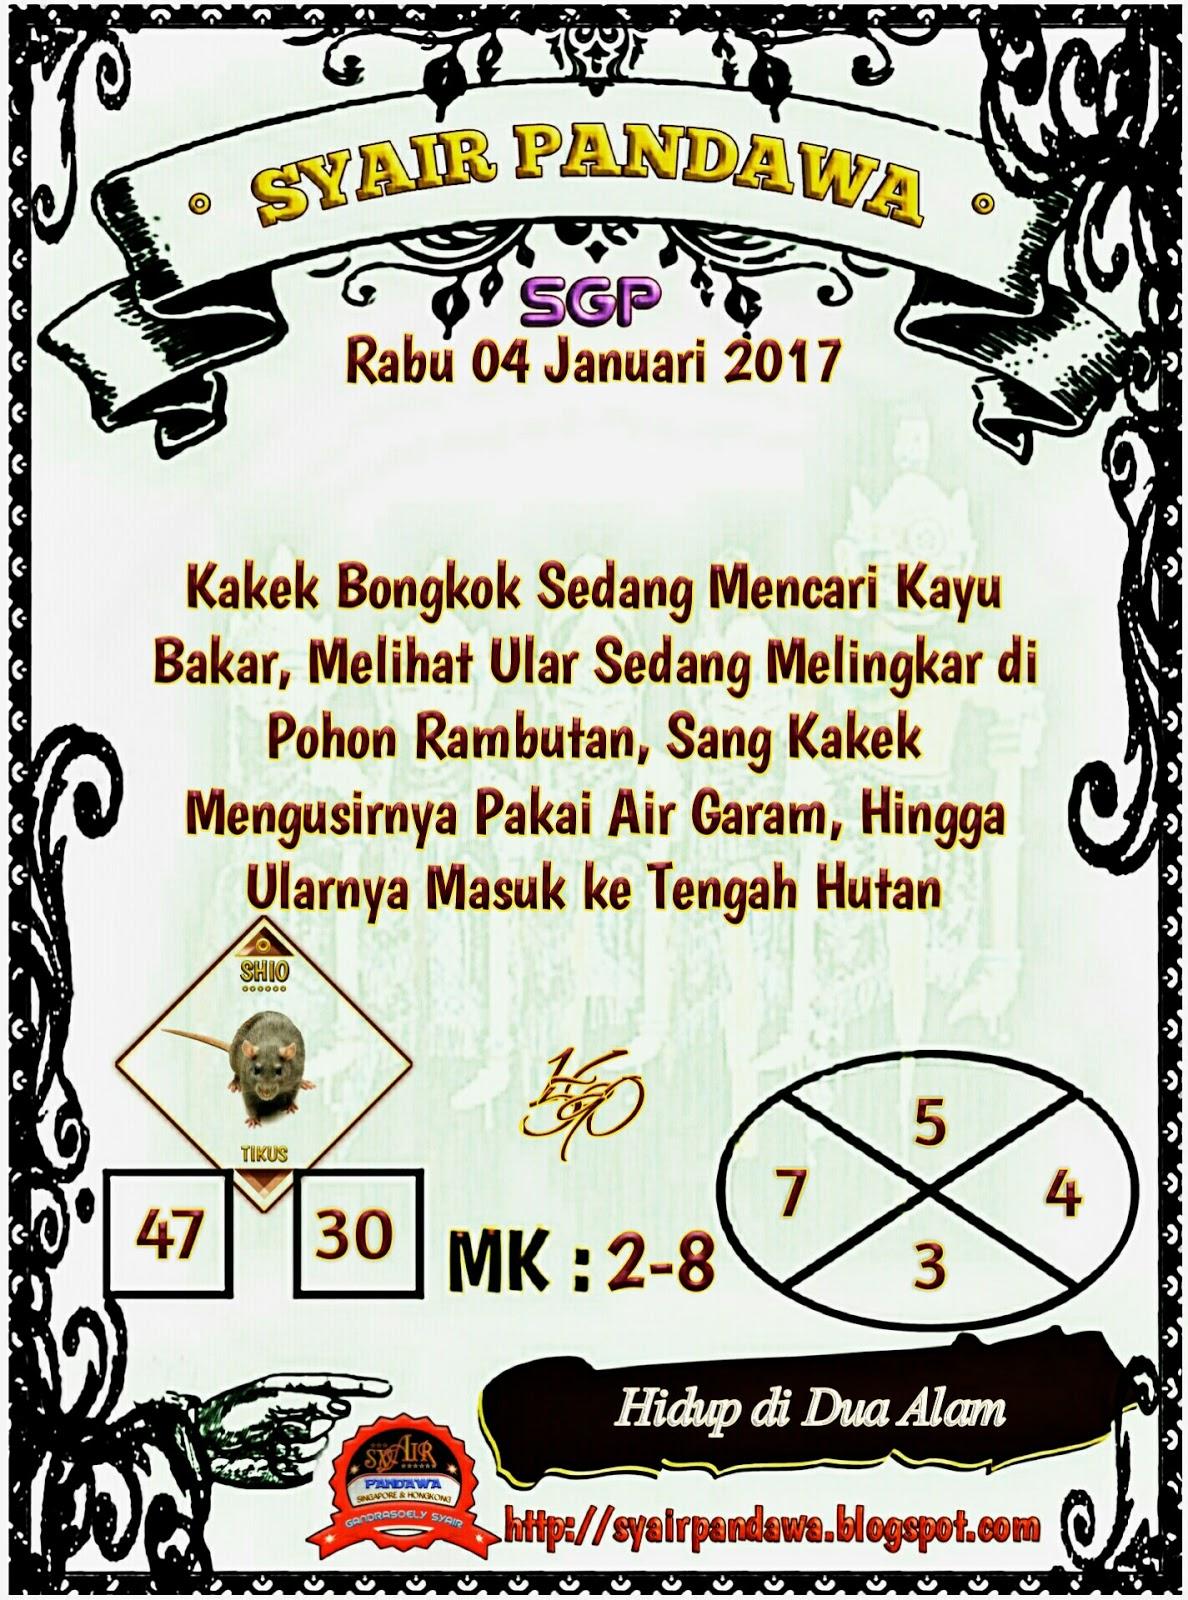 Syair Sgp Rabu 04 Jan 2017 Indowlatoto